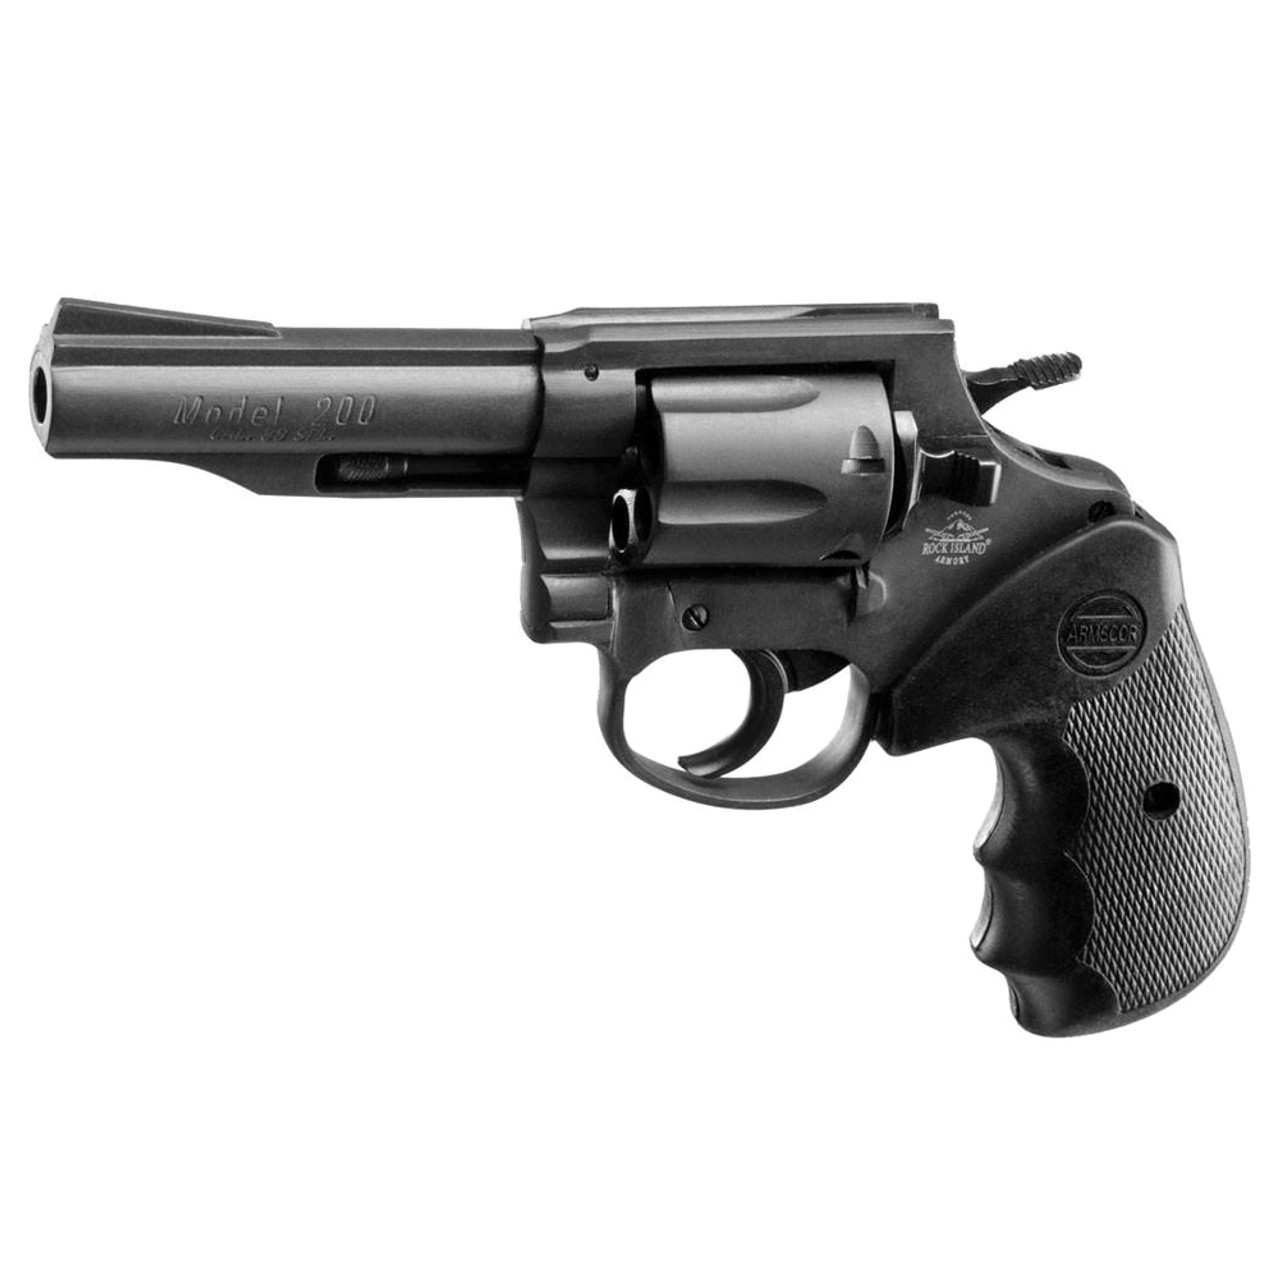 ARMSCOR M200 38 Special 4in 6rd Revolver (51261)